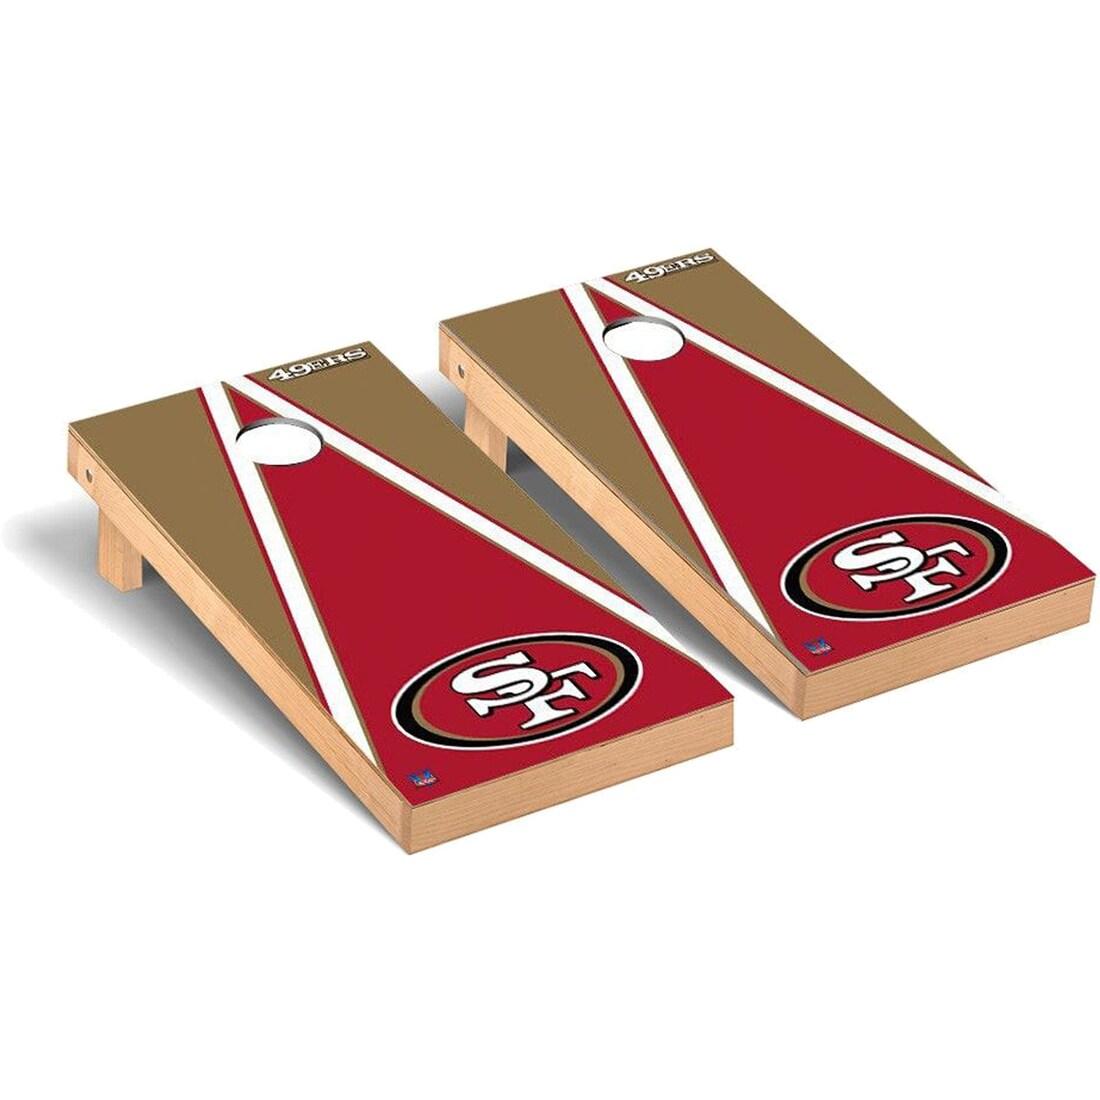 San Francisco 49ers 2' x 4' Triangle Cornhole Board Tailgate Toss Set